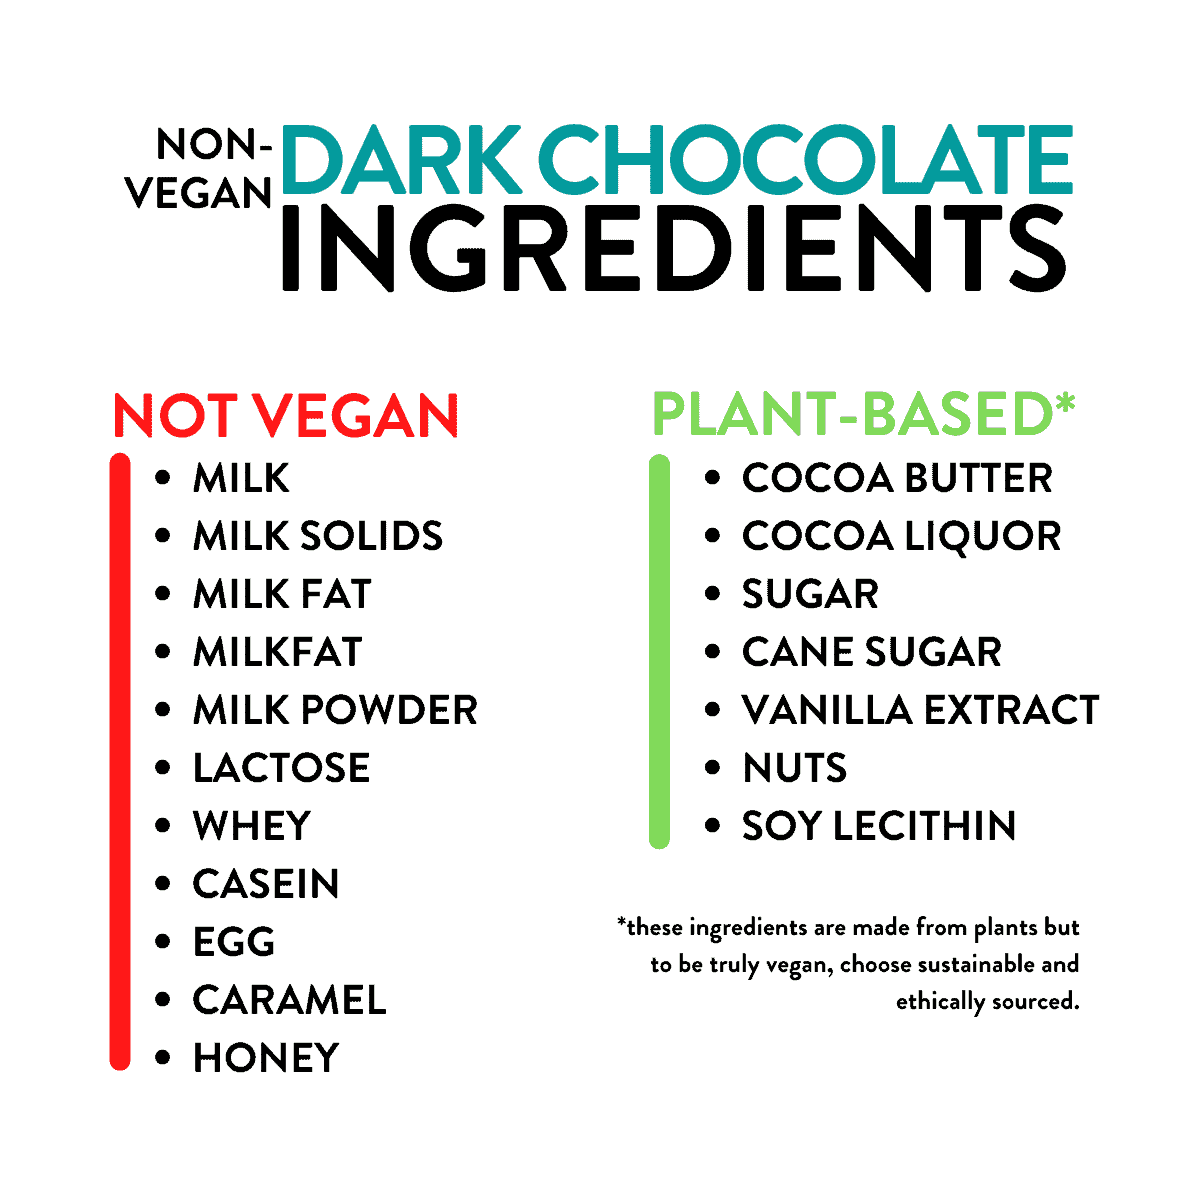 Non-vegan Ingredients Dark Chocolate